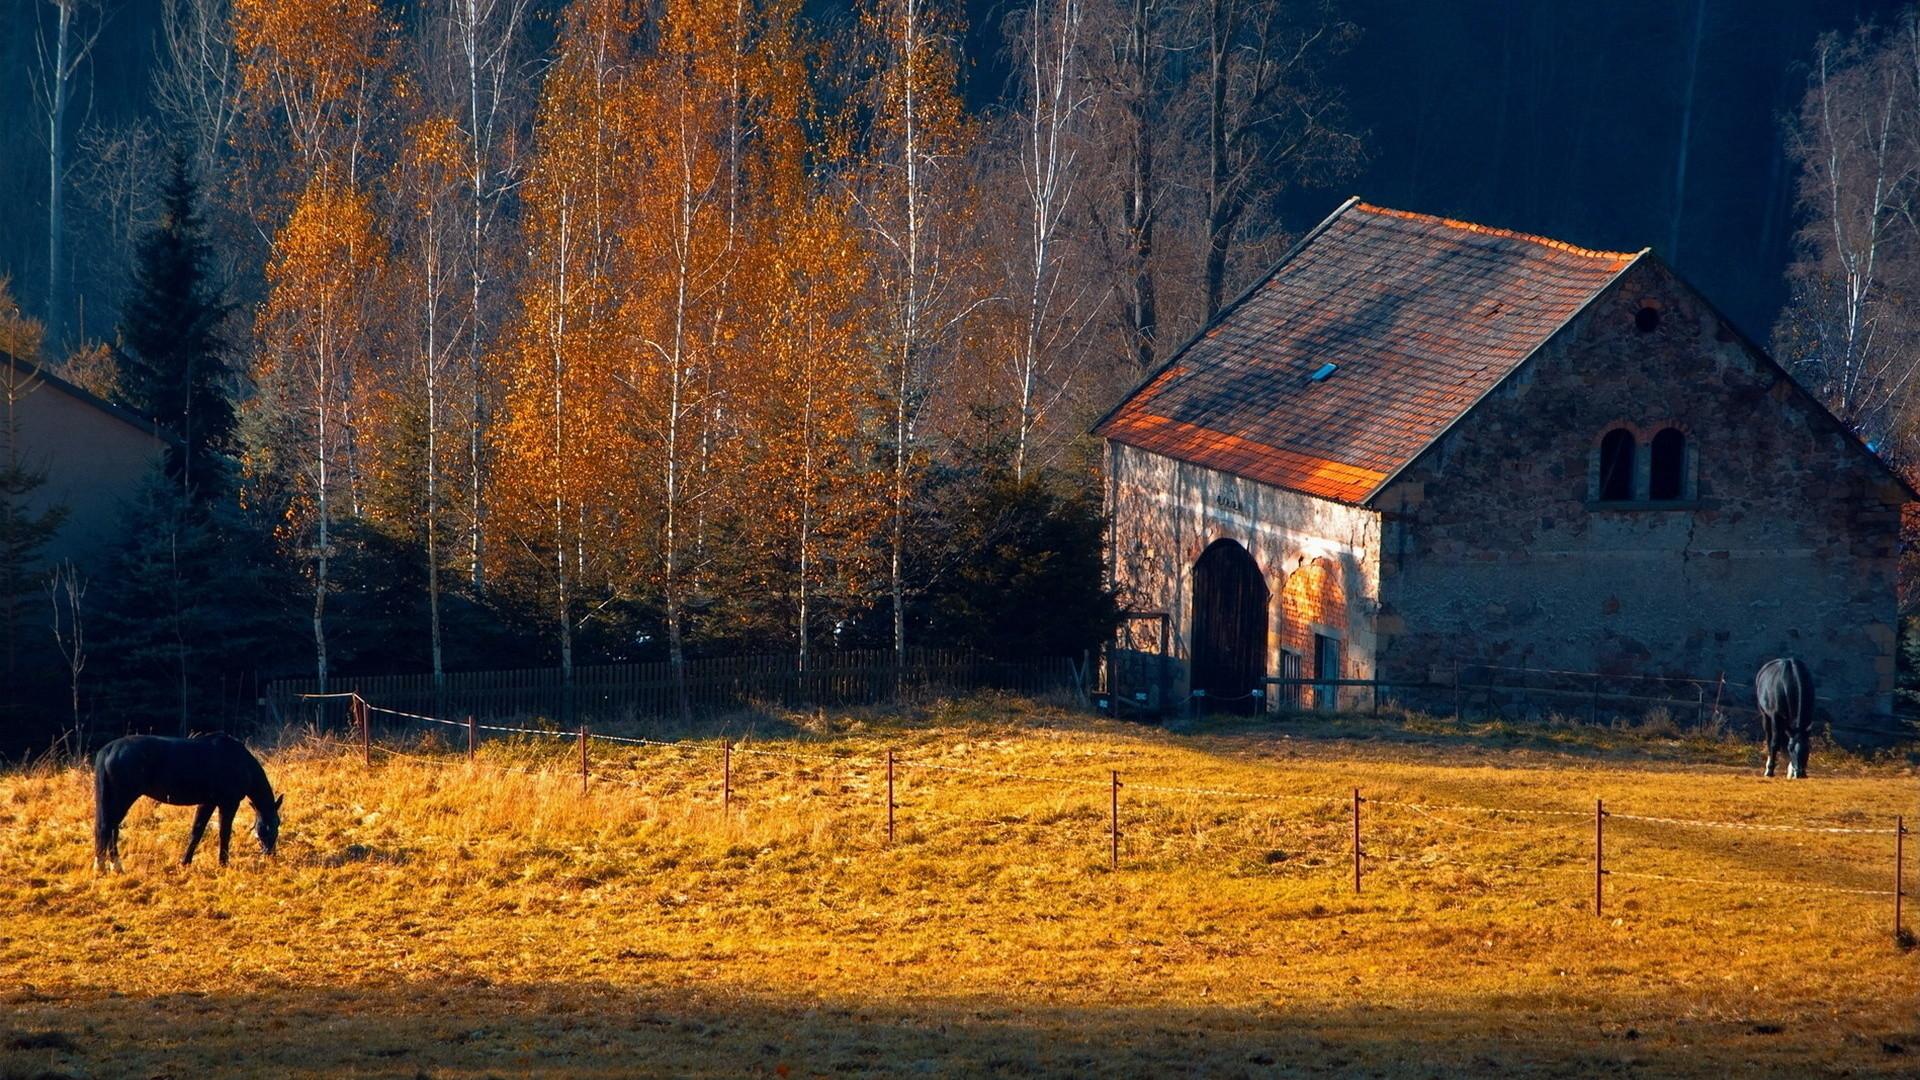 1920x1080 Horses Rustic Farm Barn Landscapes Buildings Autumn Fall Trees